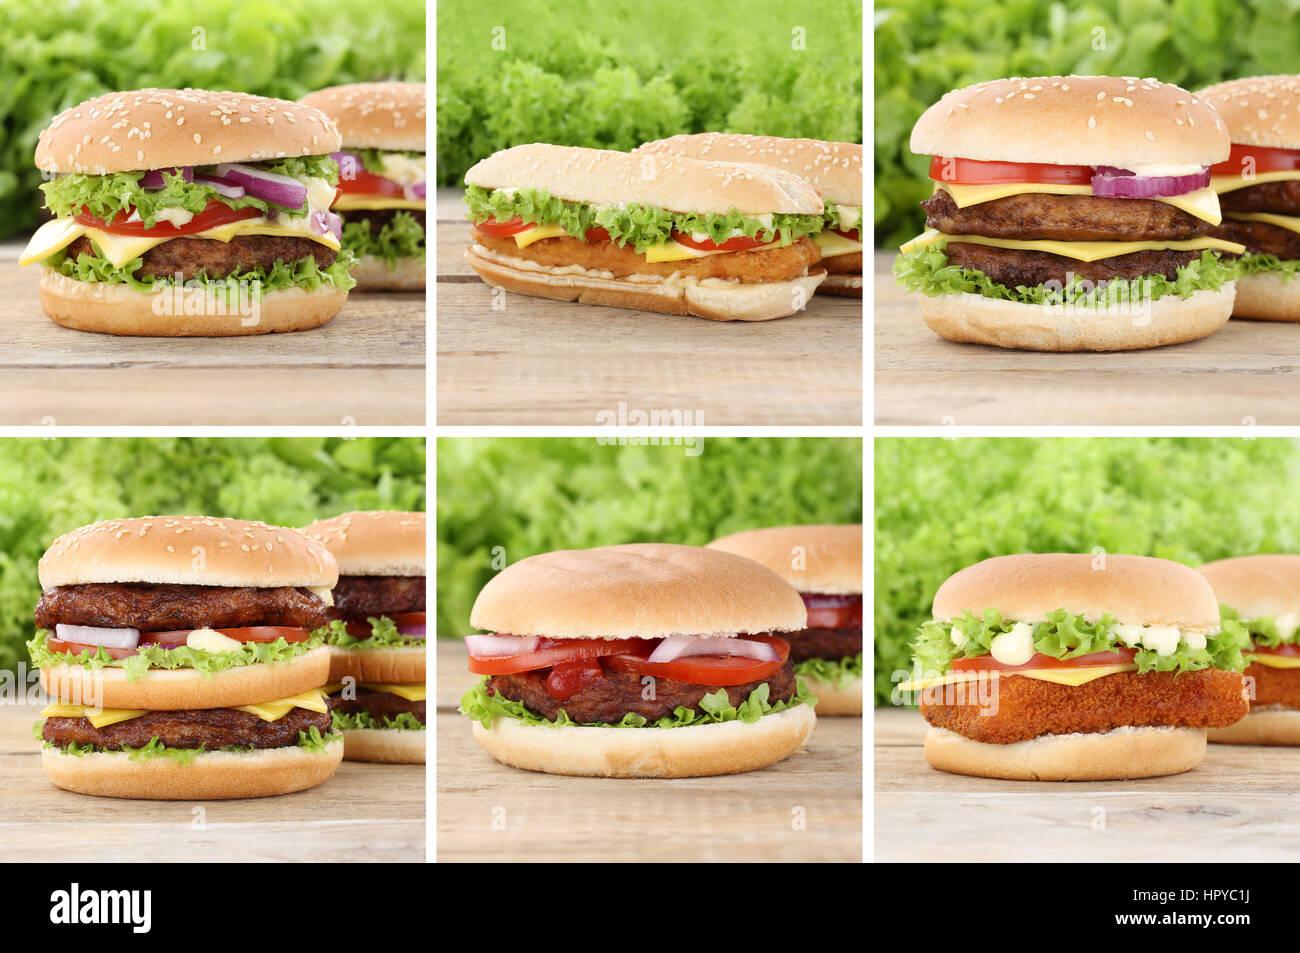 Hamburger Sammlung cheeseburger Tomaten Käse das ungesunde Essen Stockbild